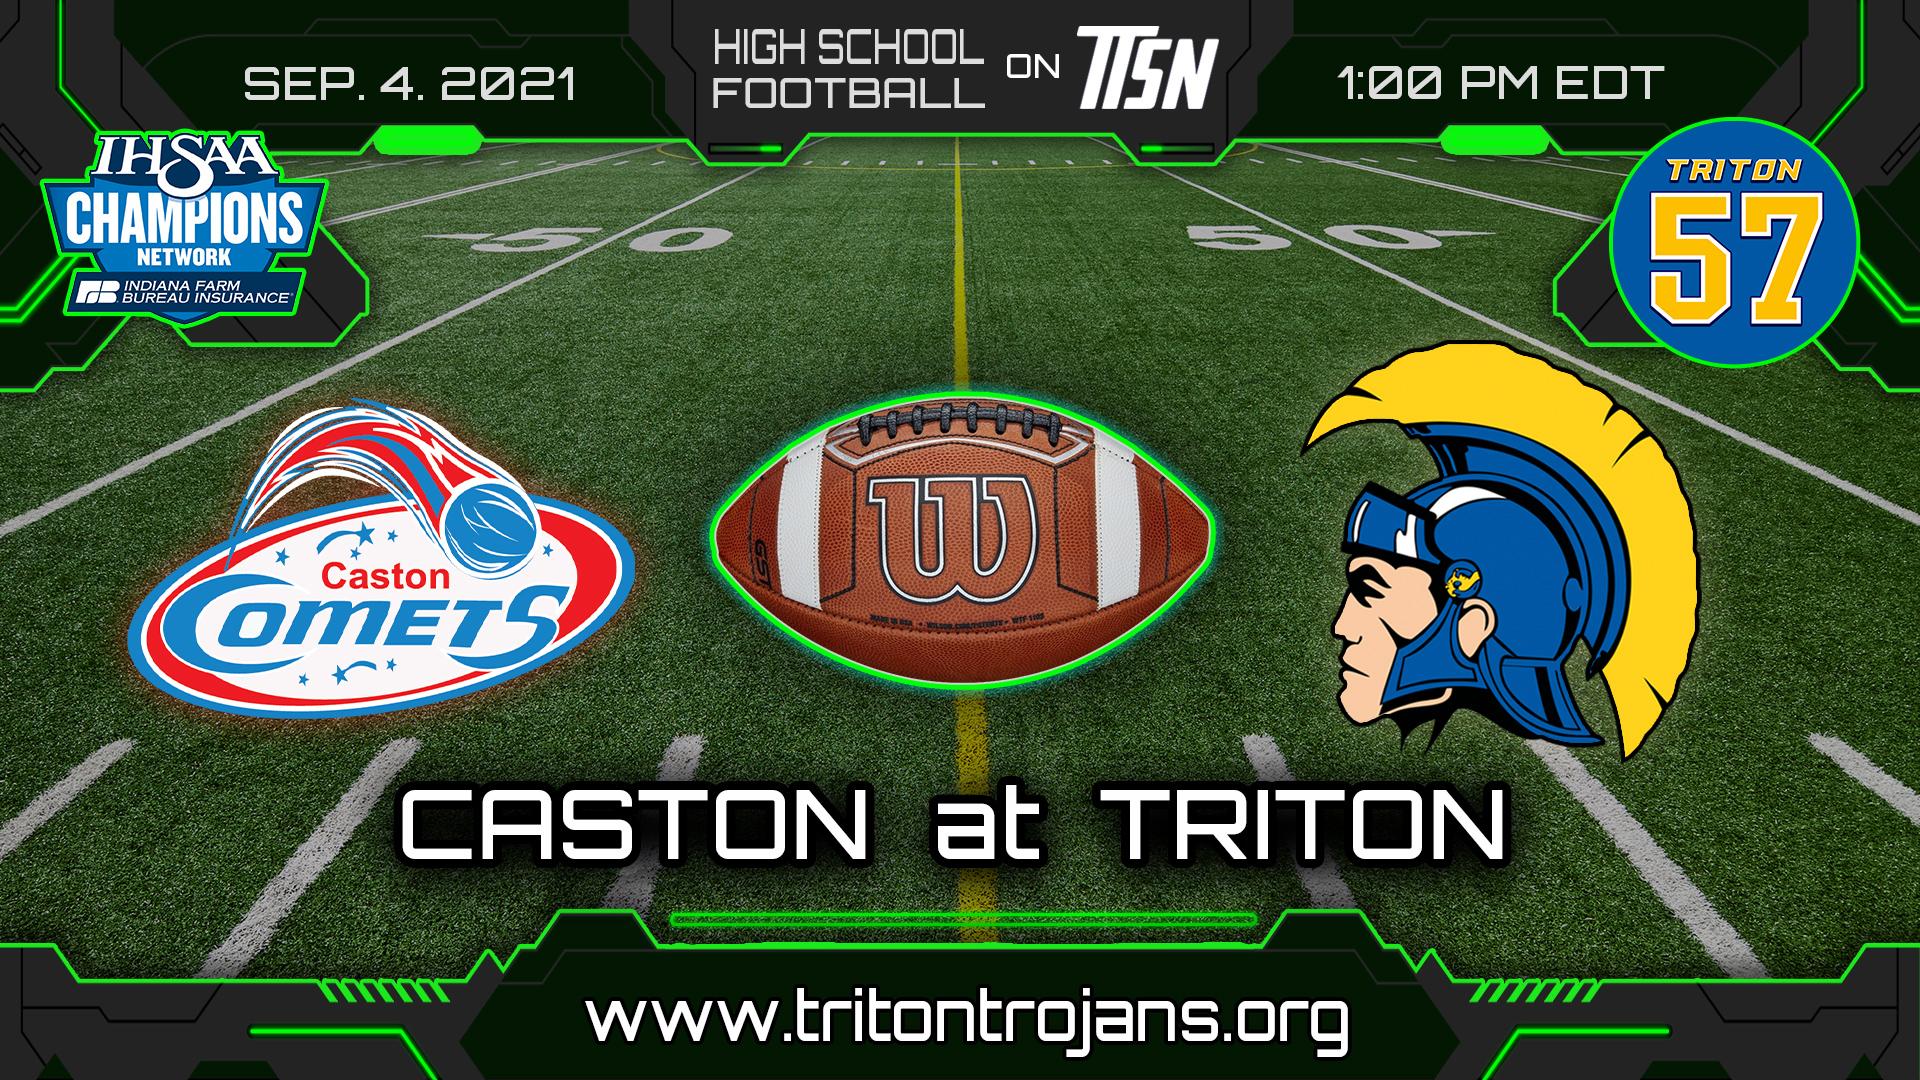 Caston at Triton Football - Gameday Info